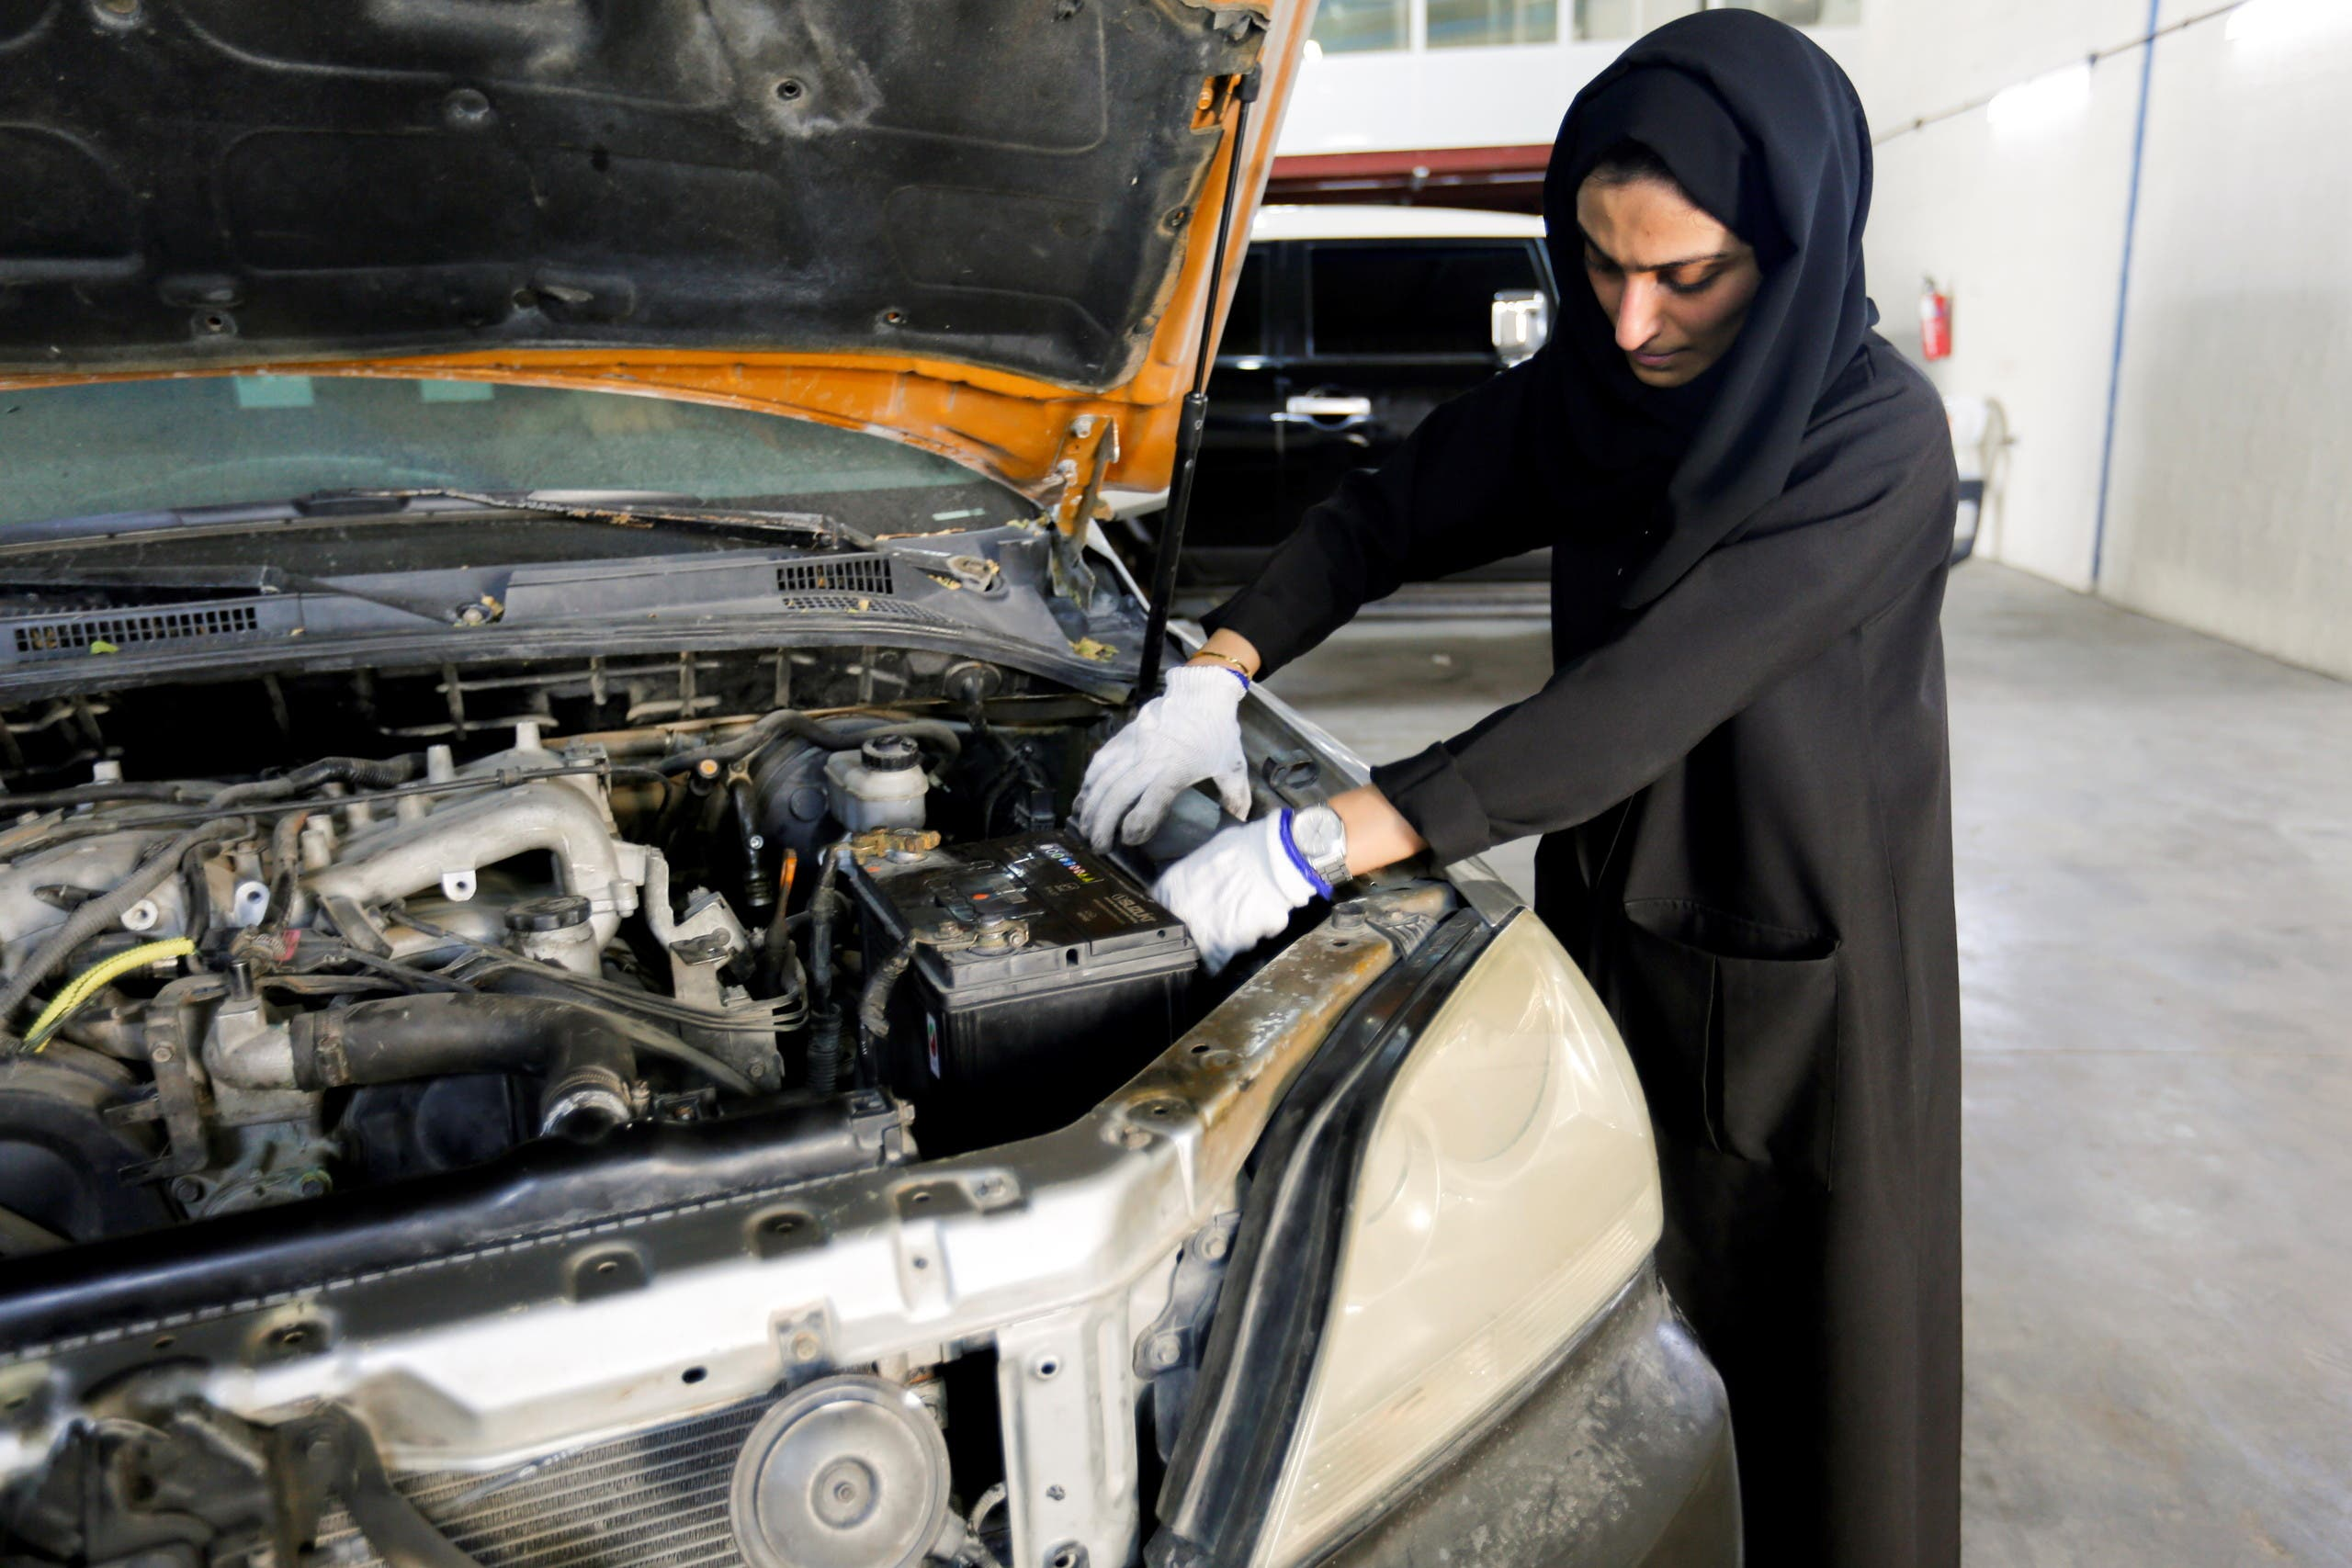 Huda al-Matrooshi, 36, an Emirati woman who owns and runs a car repair garage, checks a car at her garage in Sharjah, United Arab Emirates April 21, 2021. (Reuters)